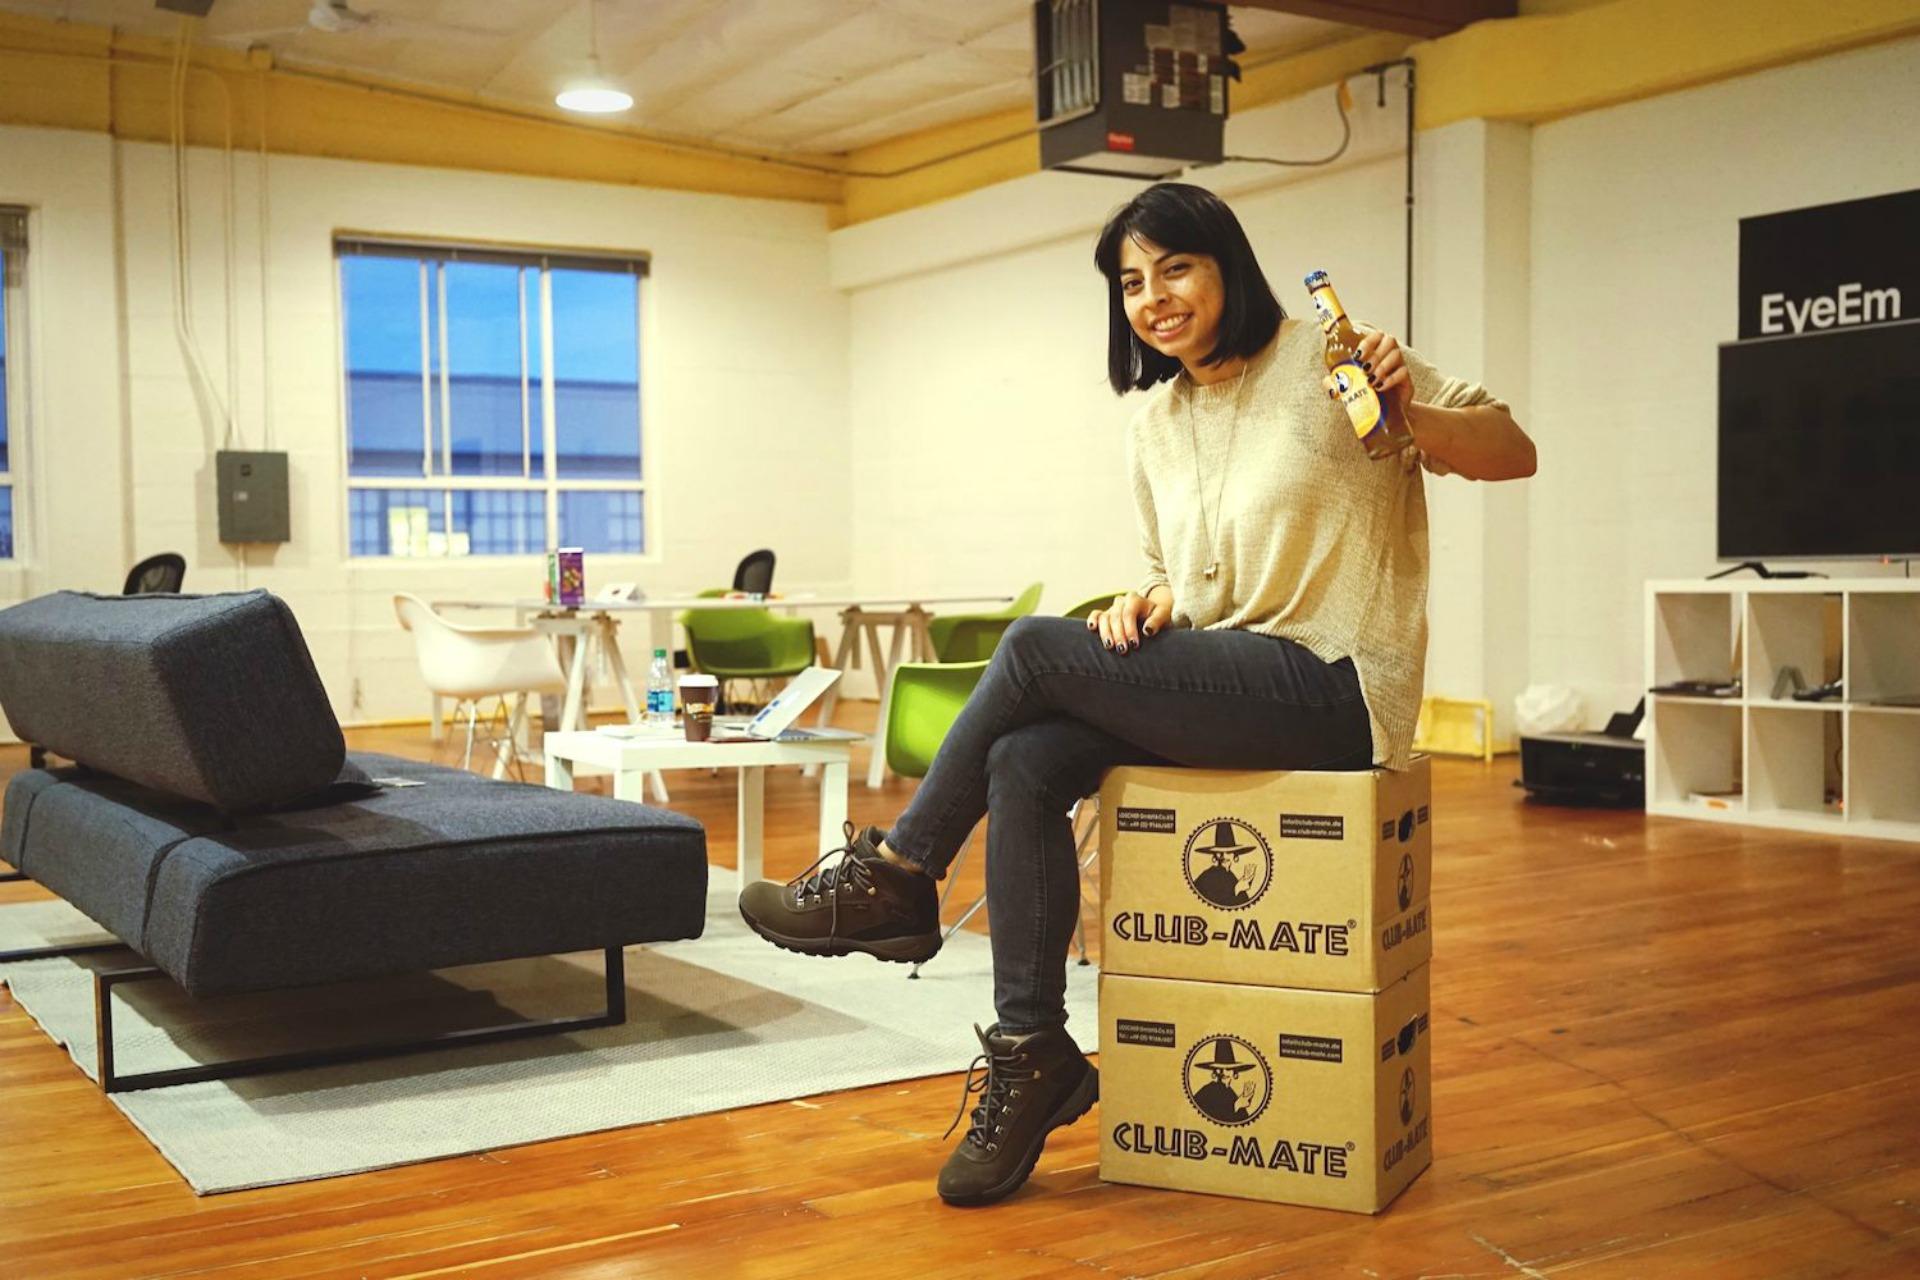 Lisbeth Ortega, EyeEm SF's blog editor with the company's stock's of Club Mate.